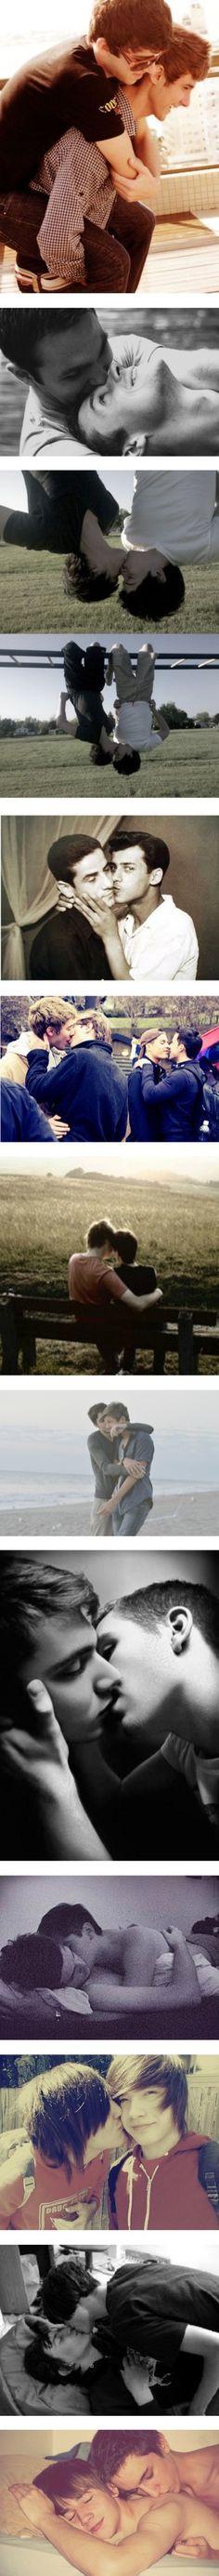 """Romantic Gay Couples"""